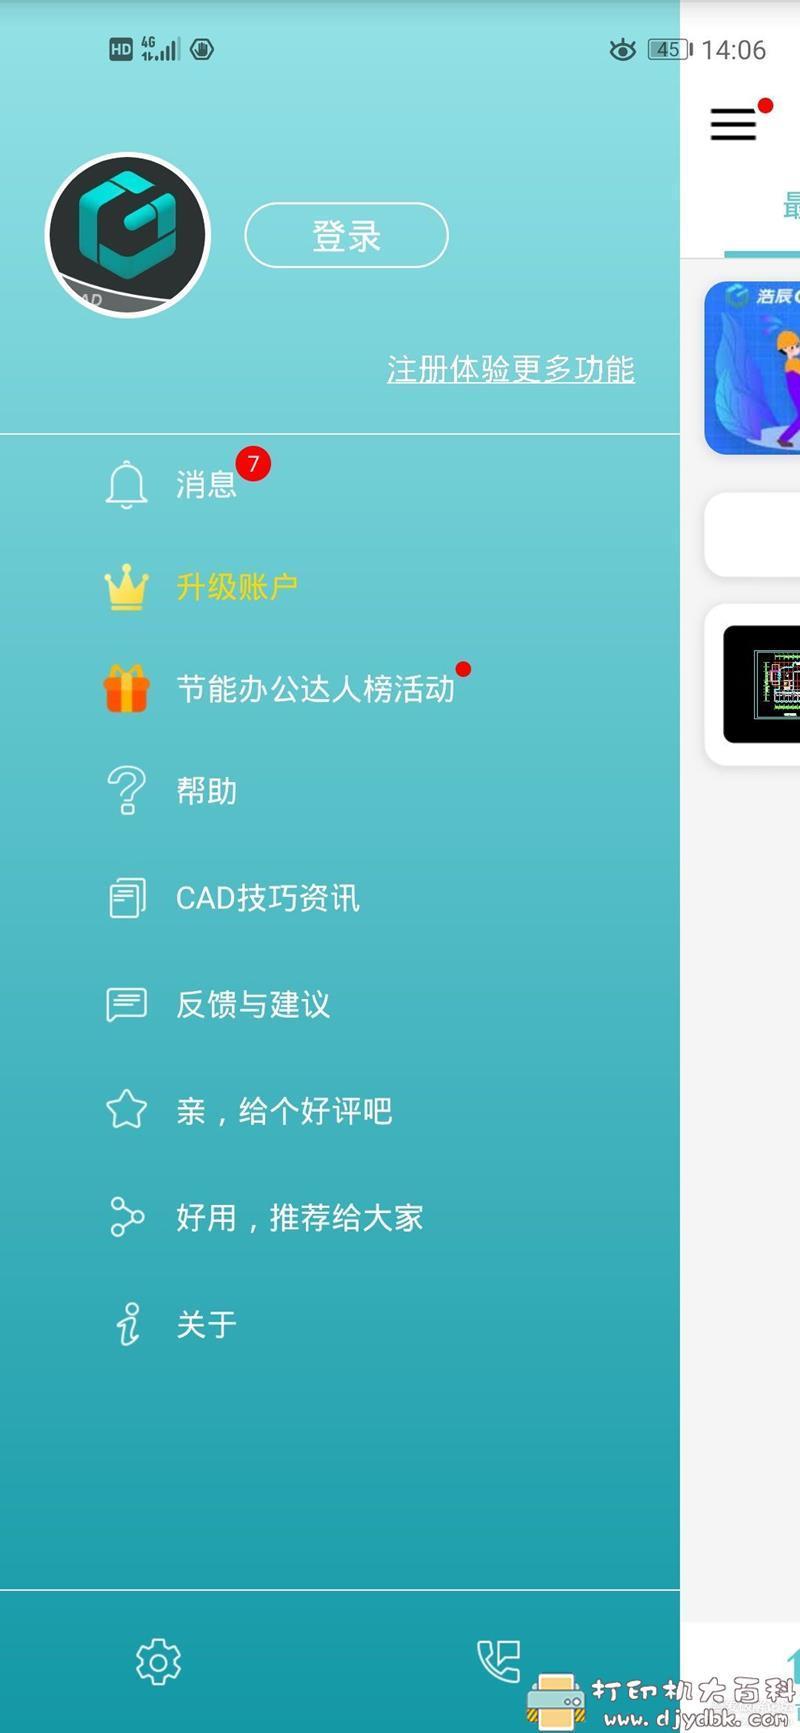 [Android]浩辰CAD看图王 v3.9.2 高级版(附电脑看图及转换器)图片 No.5